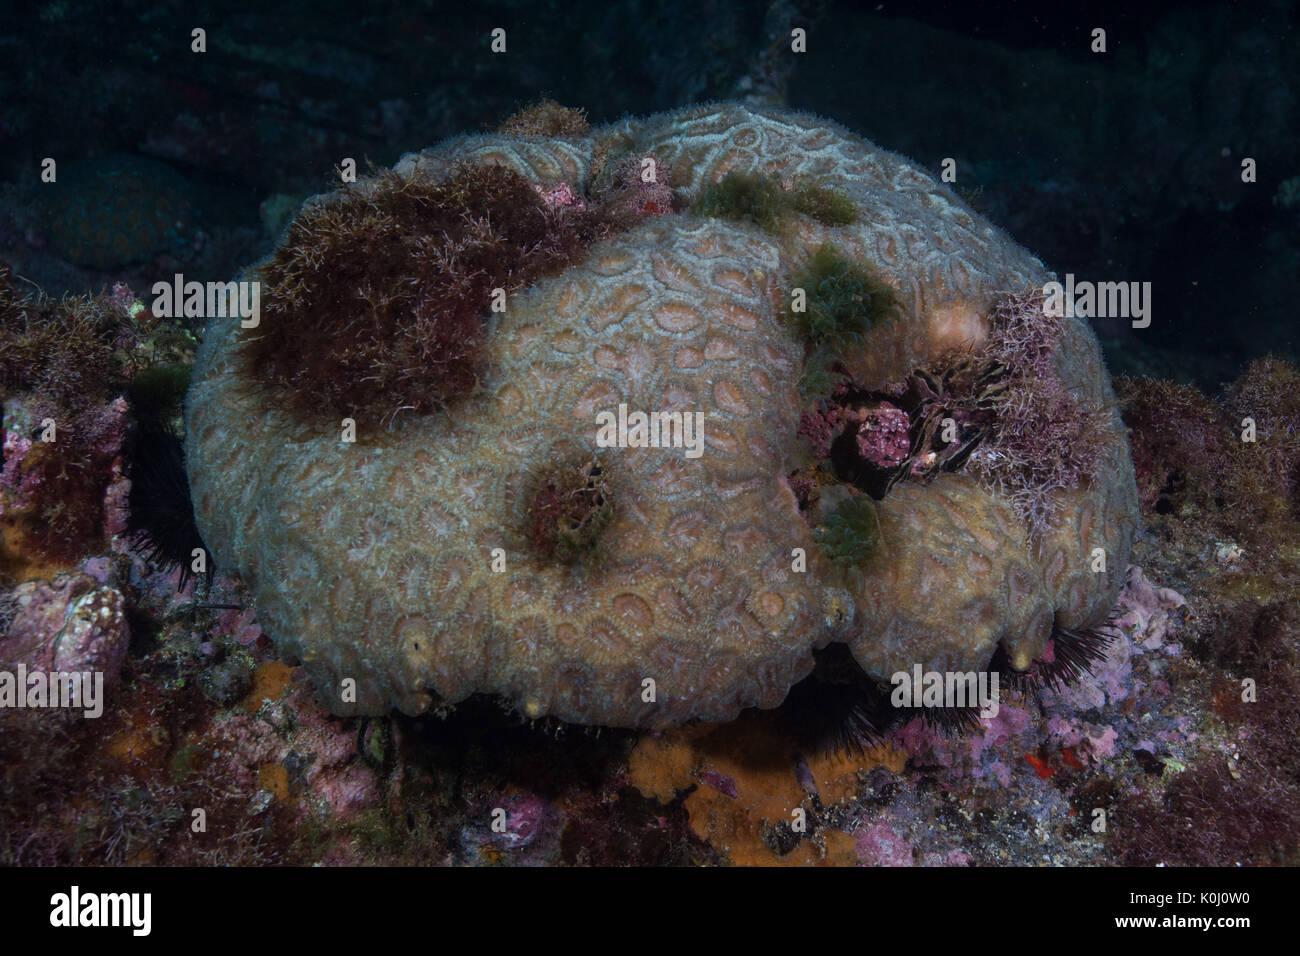 coral genus mussismilia underwater Ilha da Queimada Grande, southeast Brazil - Stock Image